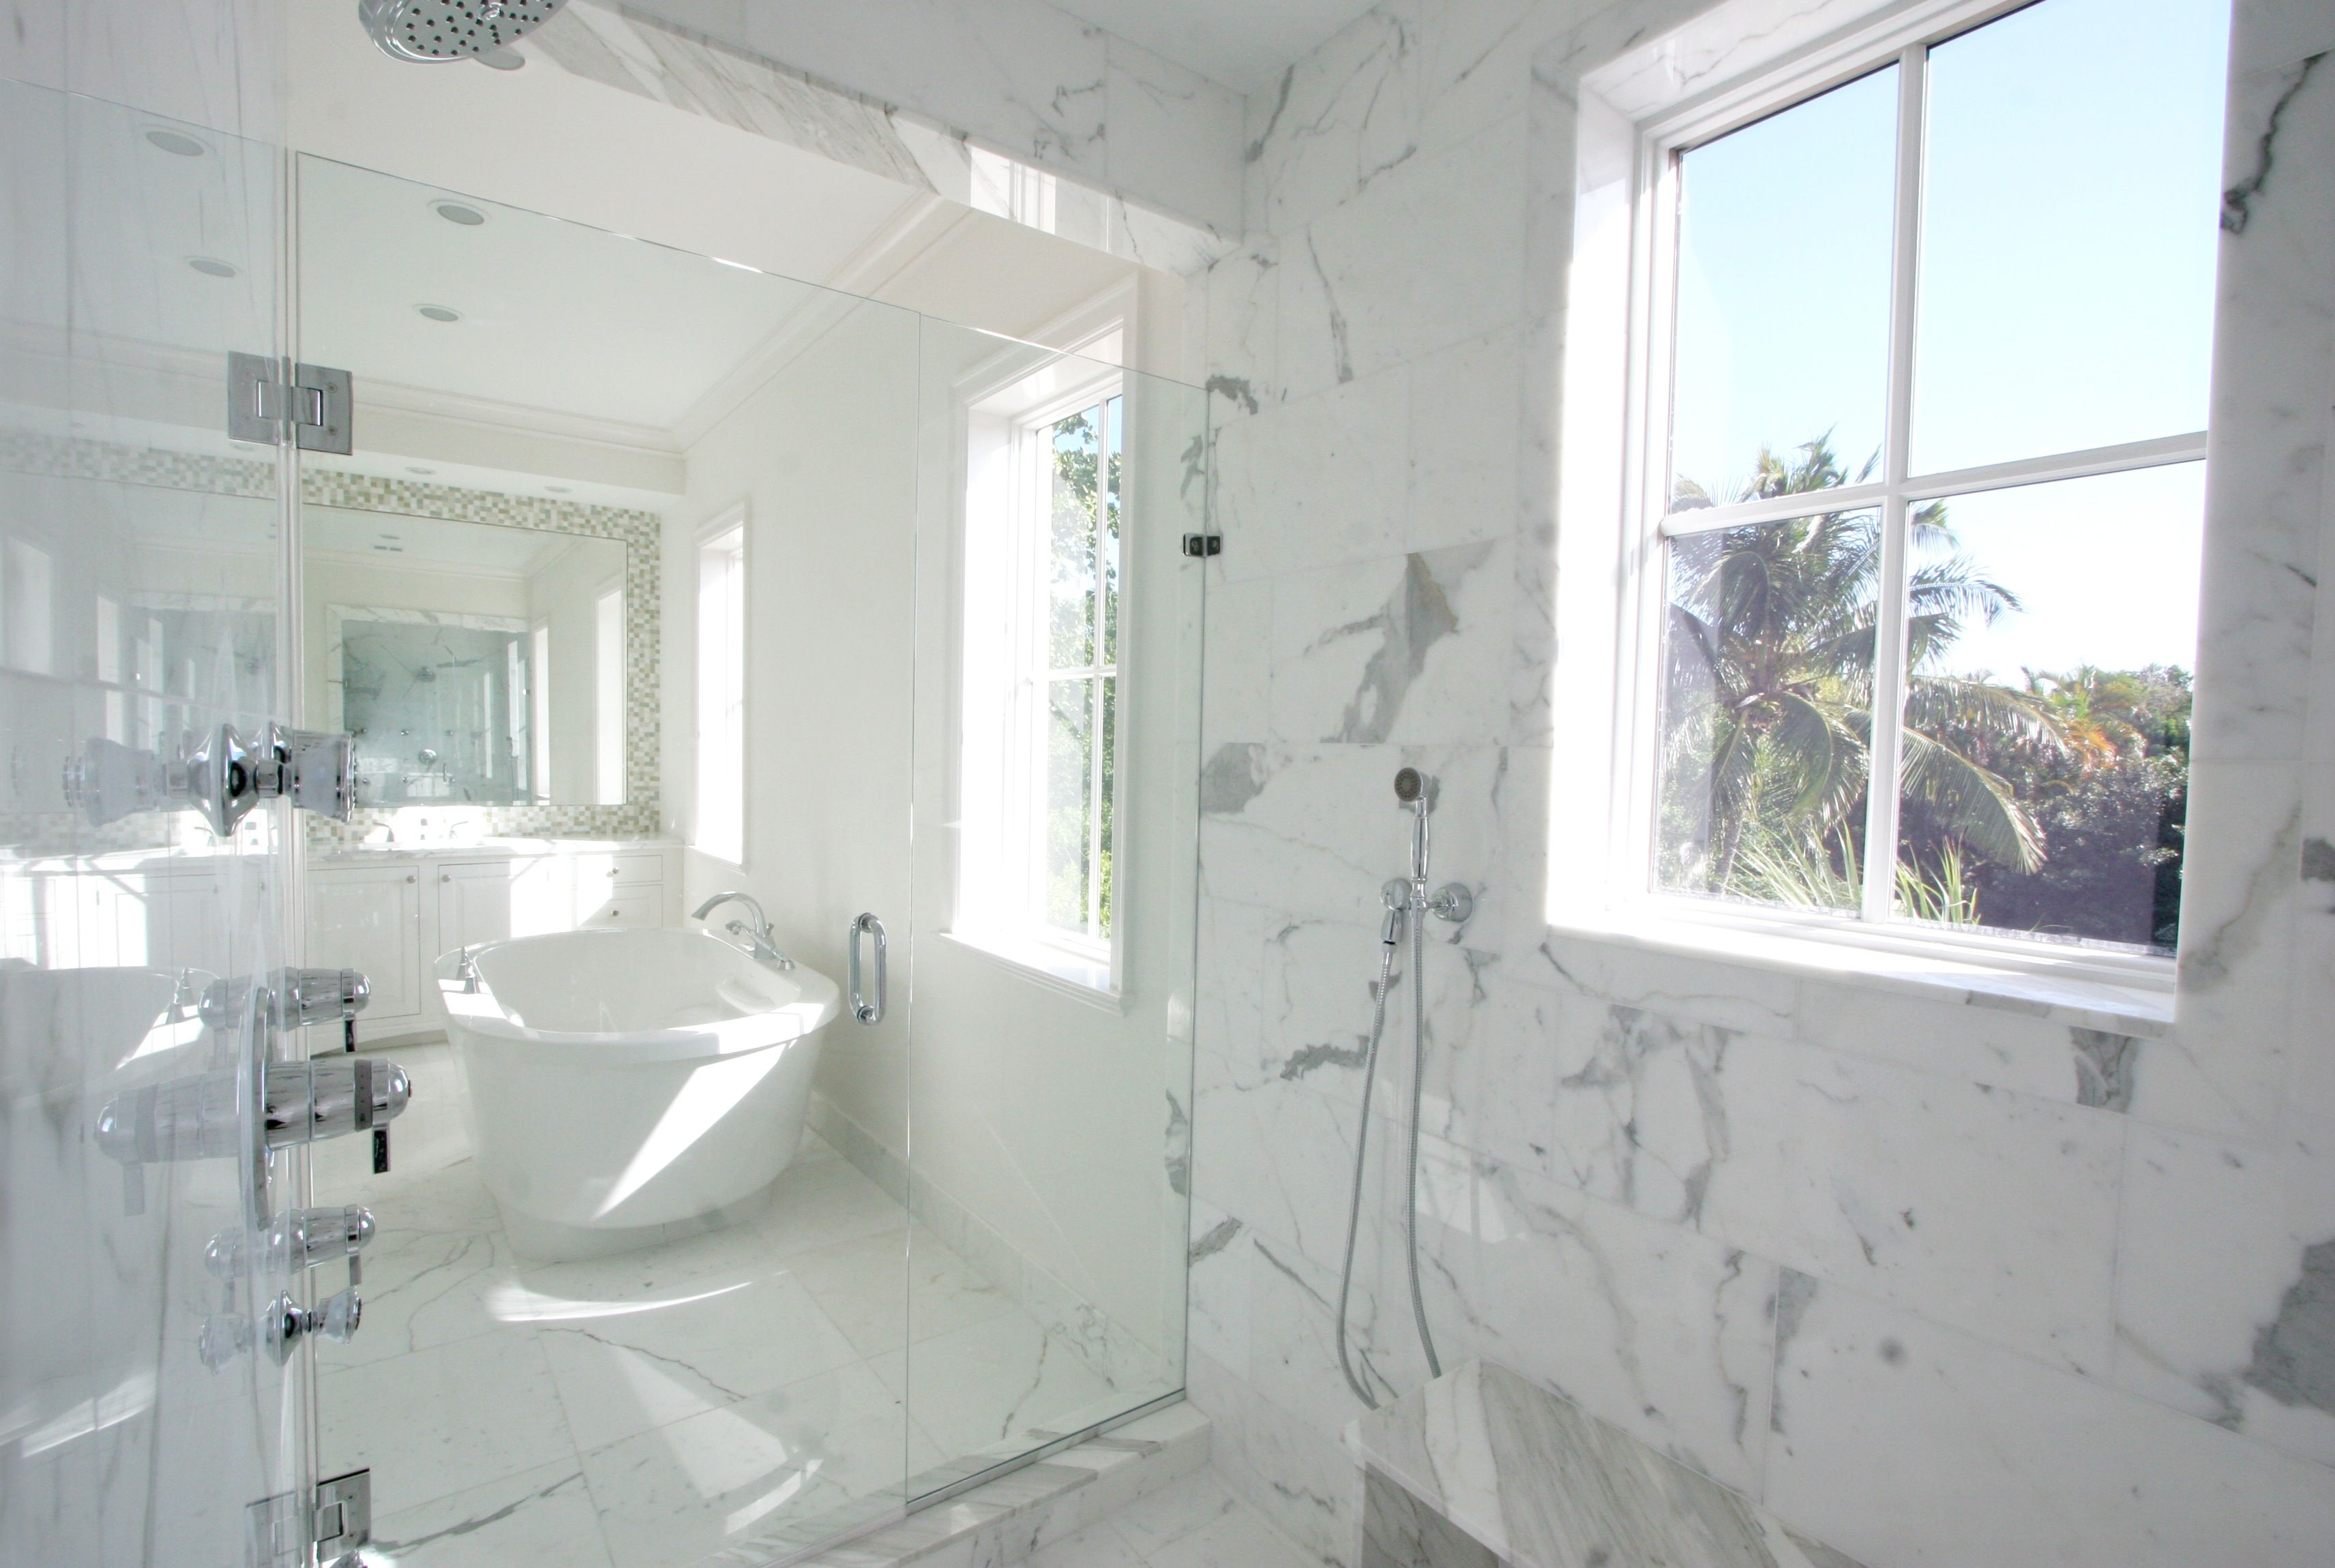 Pin by Arc Stone & Tile on Italian White Marble Tile | Pinterest ...